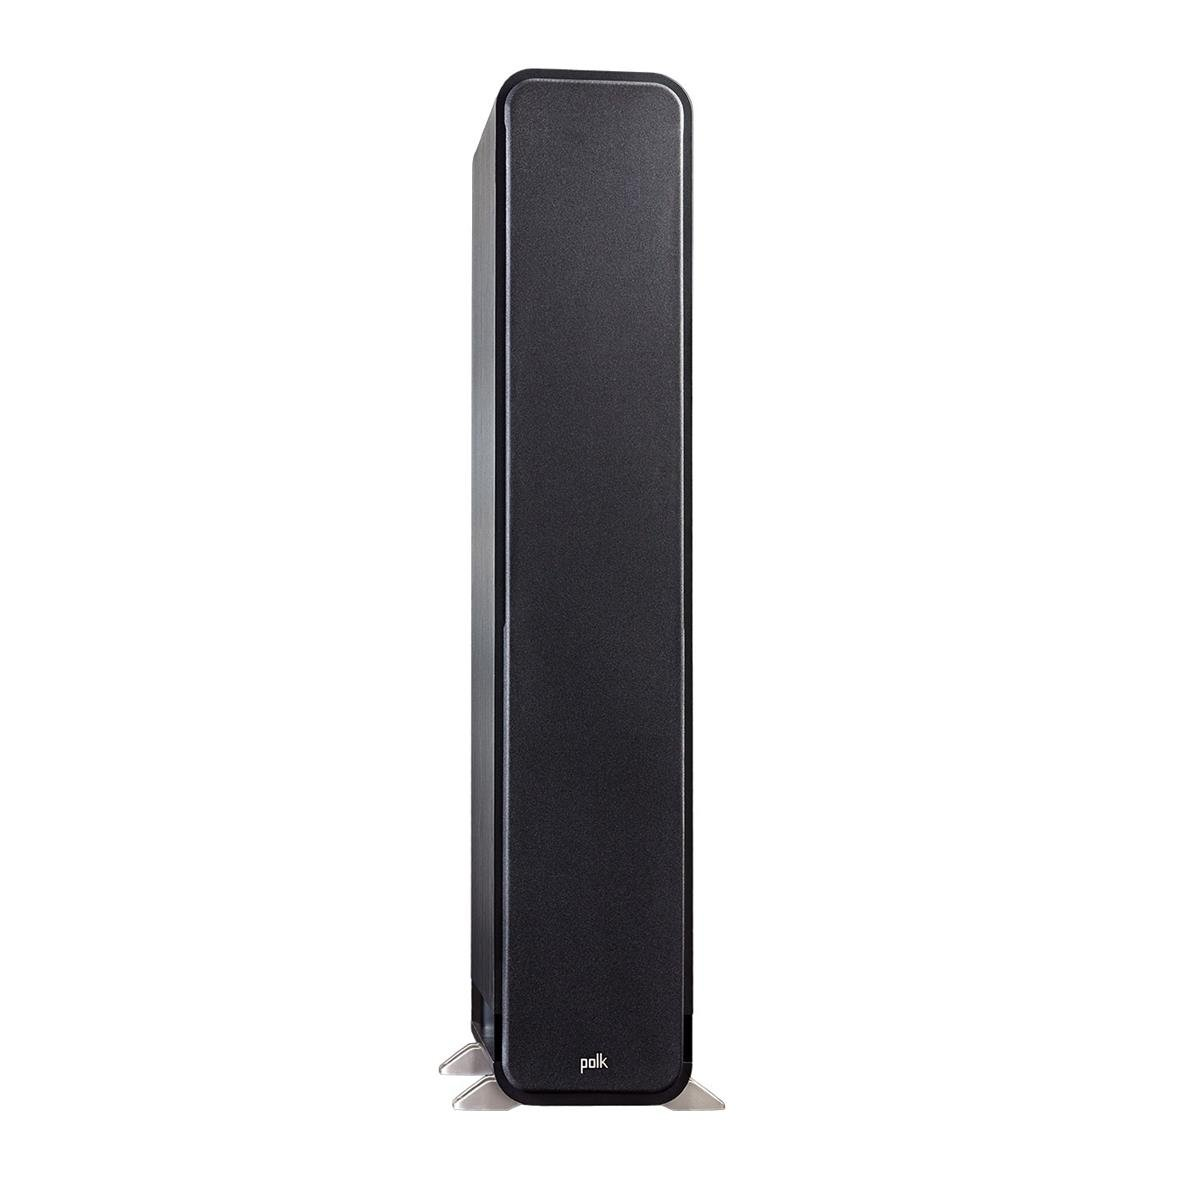 Polk Audio Signature S60 American HiFi Home Theater Tower Speaker (Single, Black)